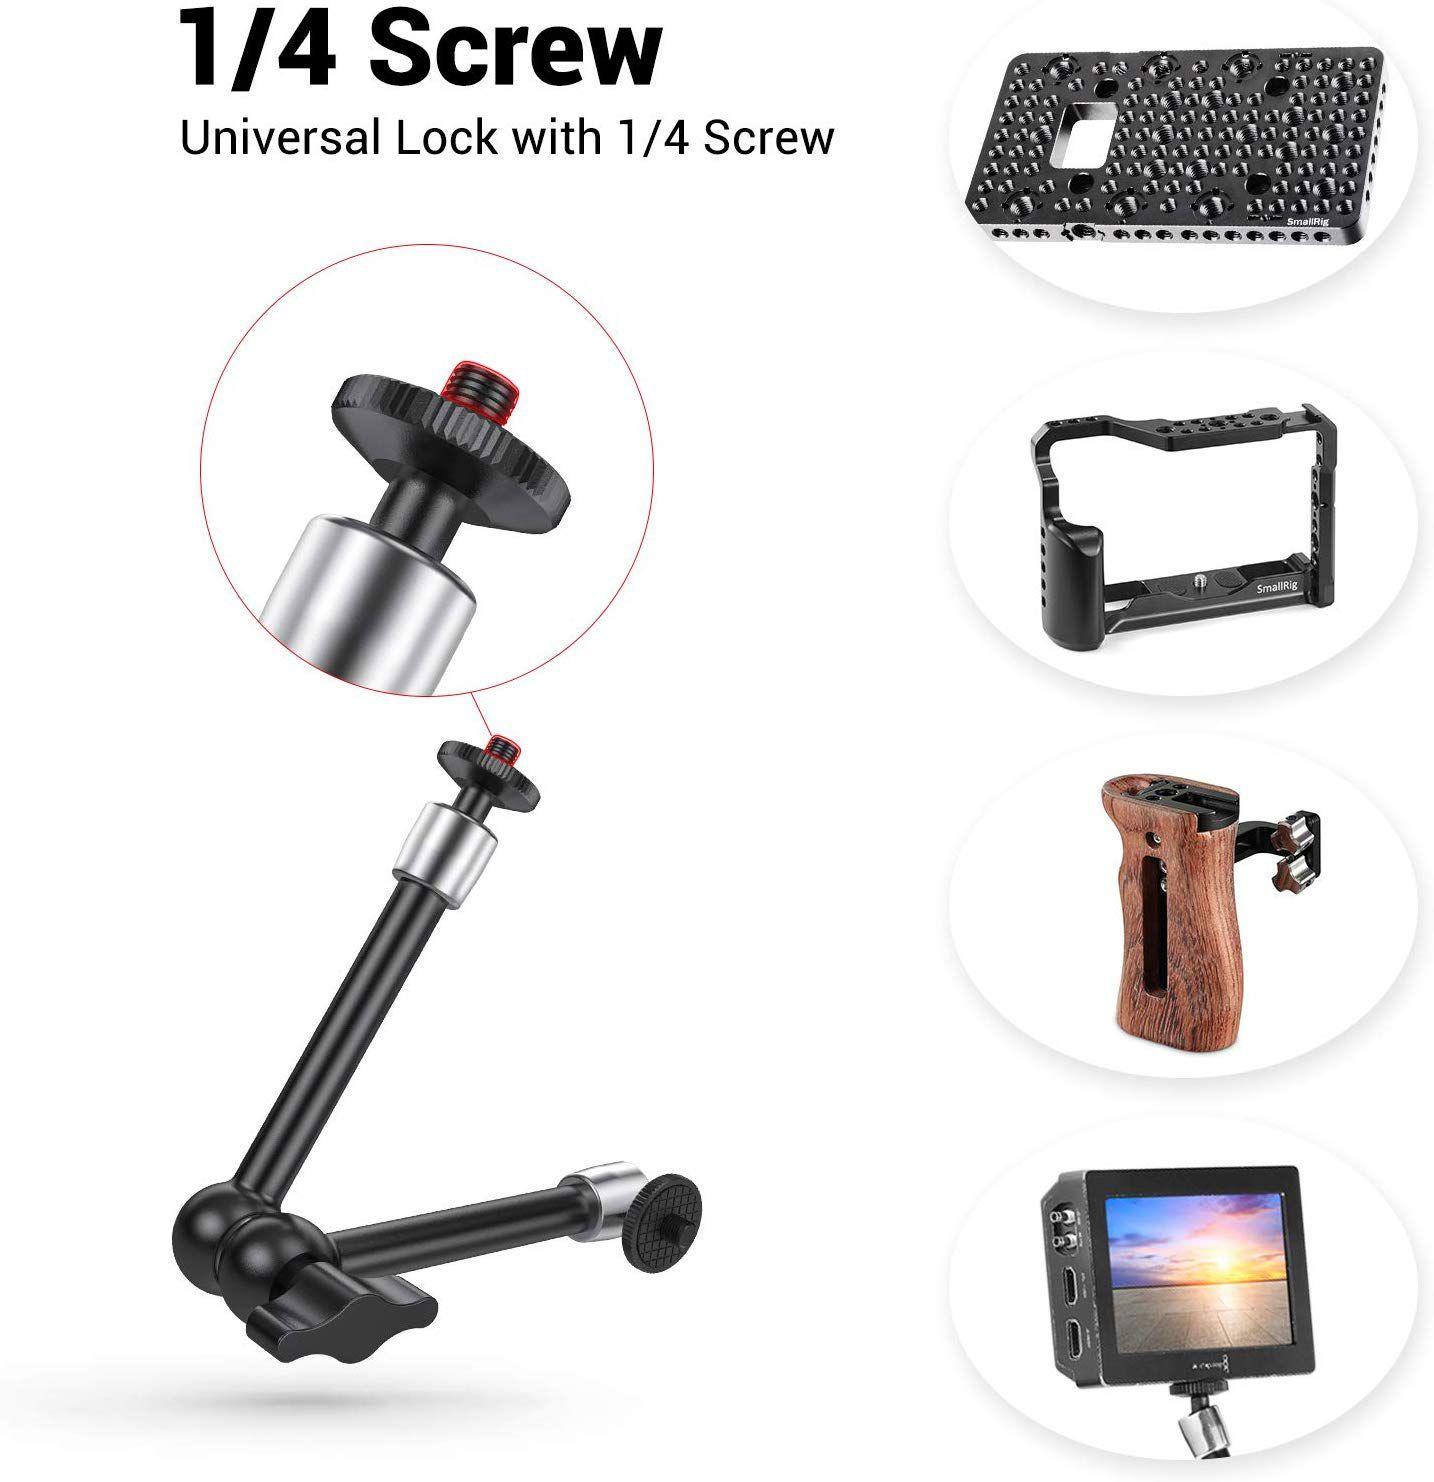 SMALLRIG 11 inch Adjustable Power Articulating-2066